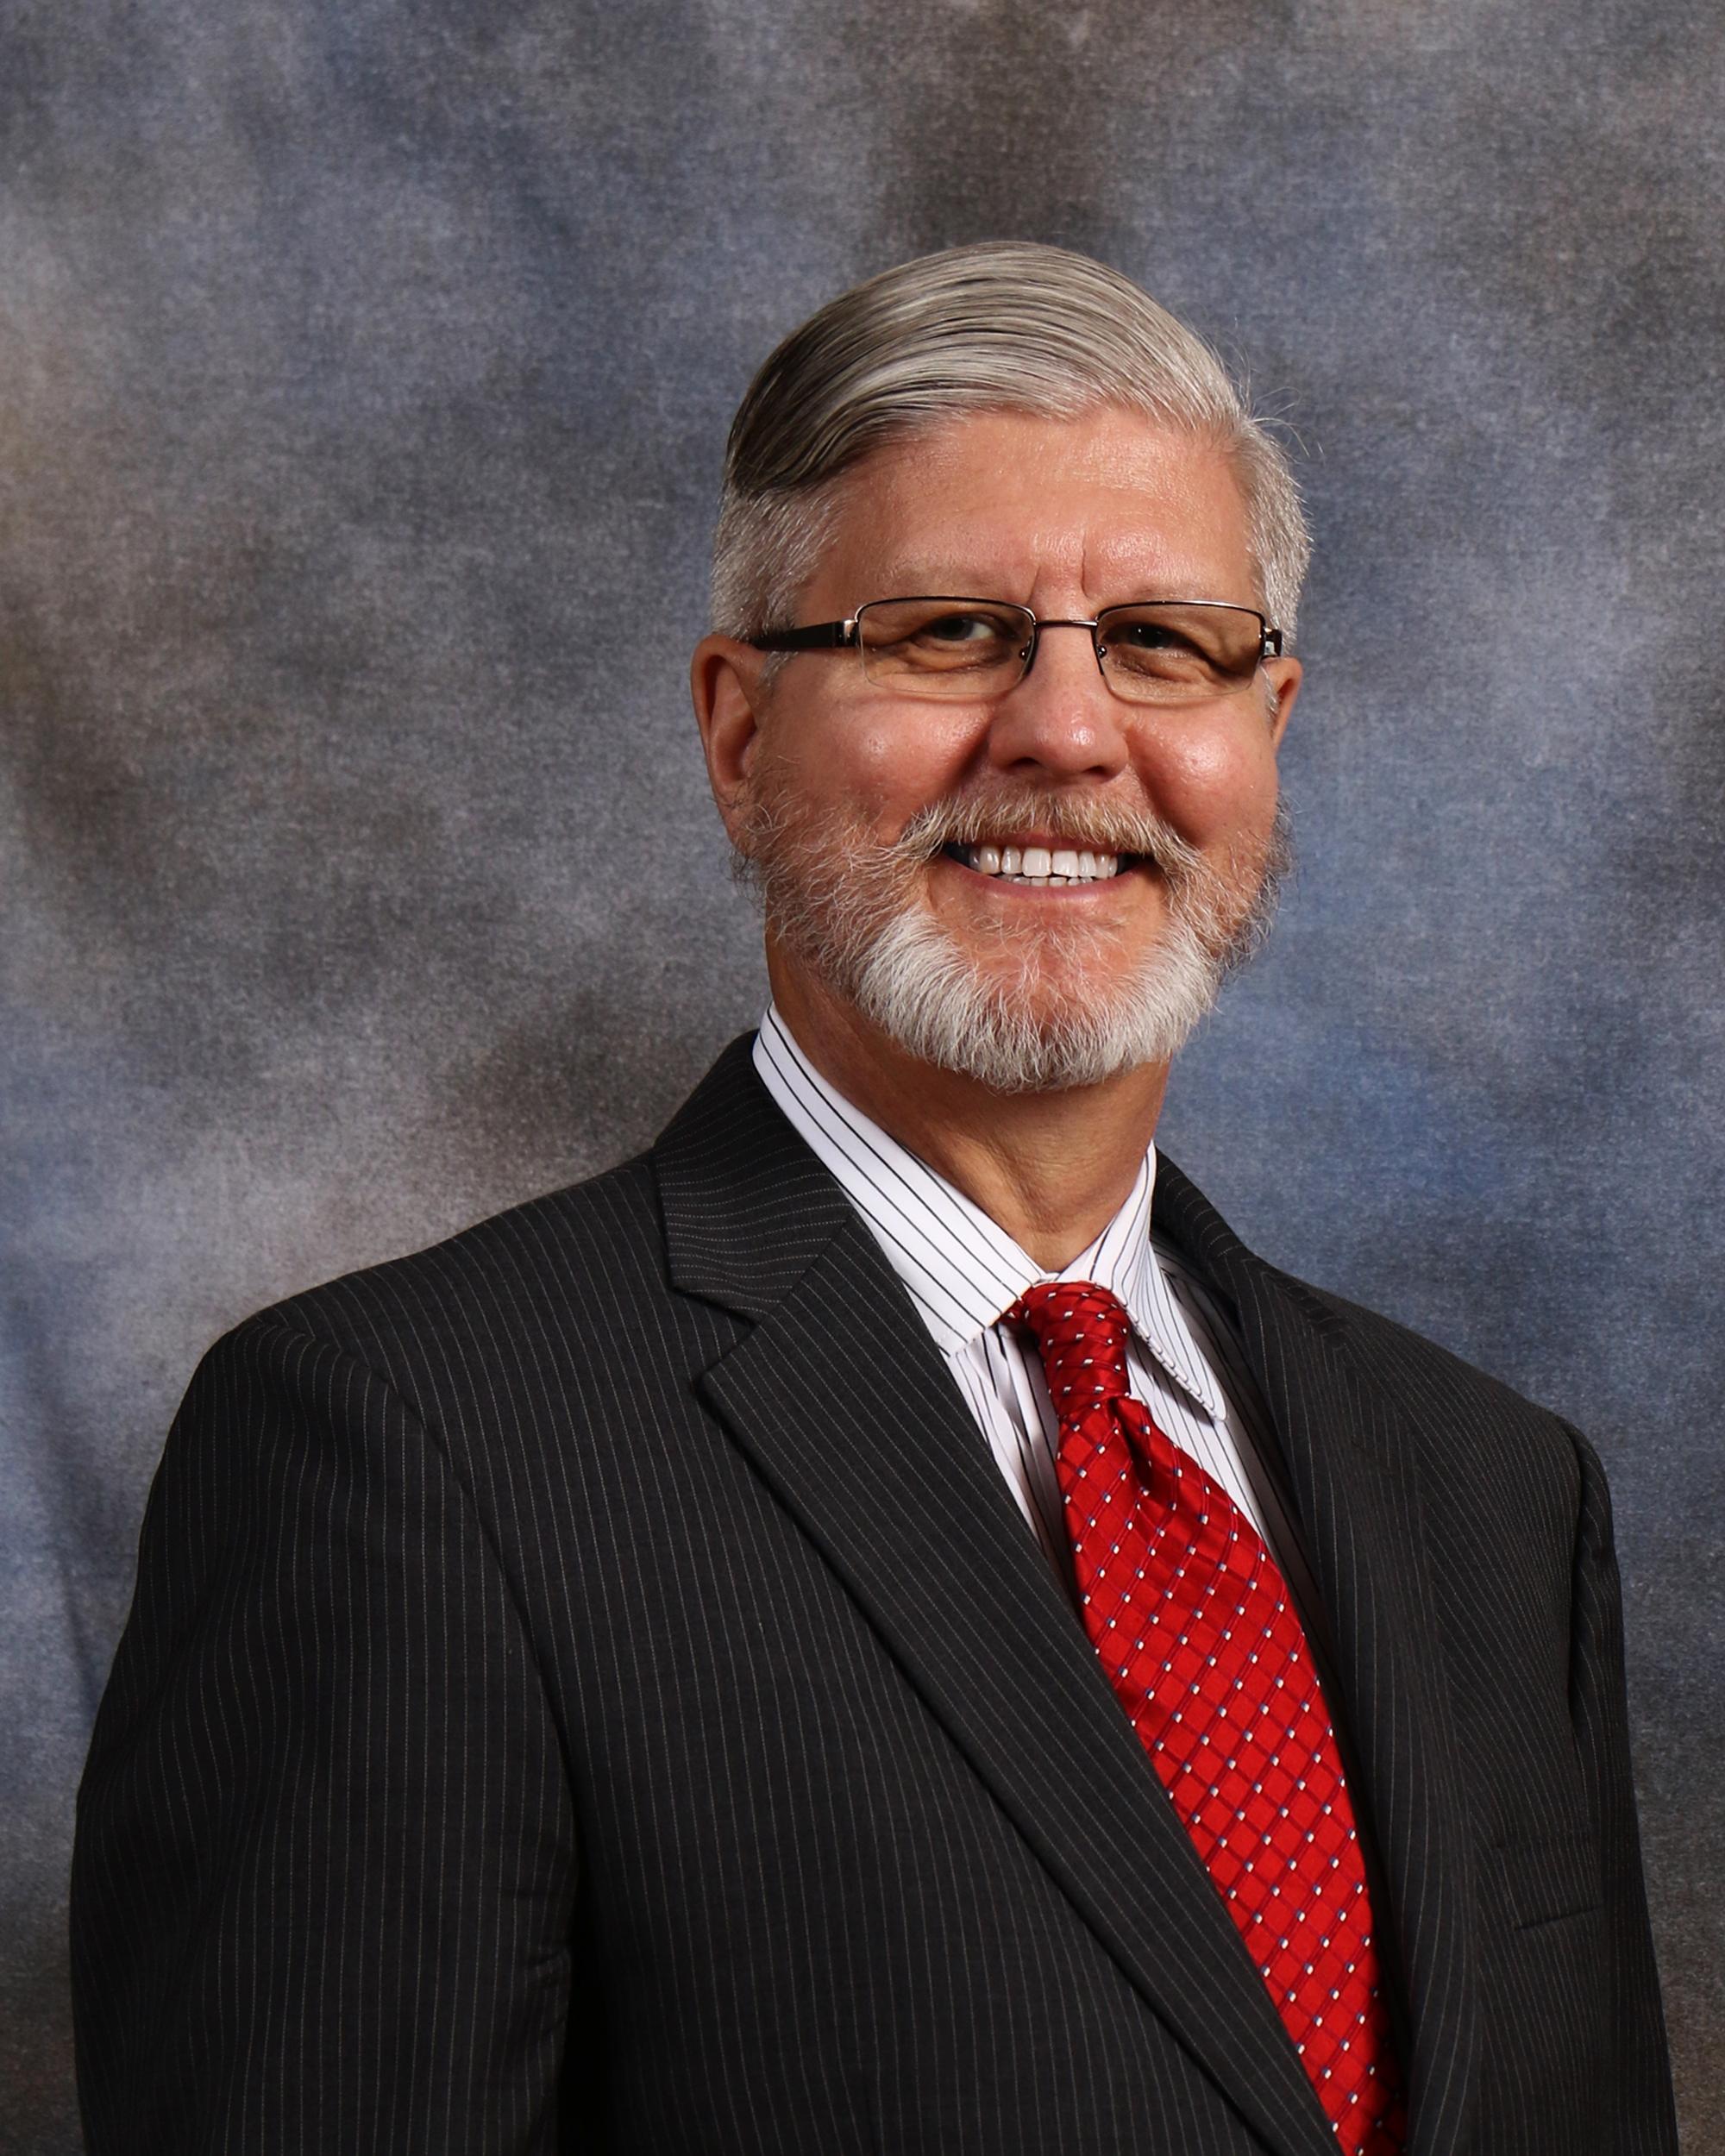 David Freriks, JD - President/Founder